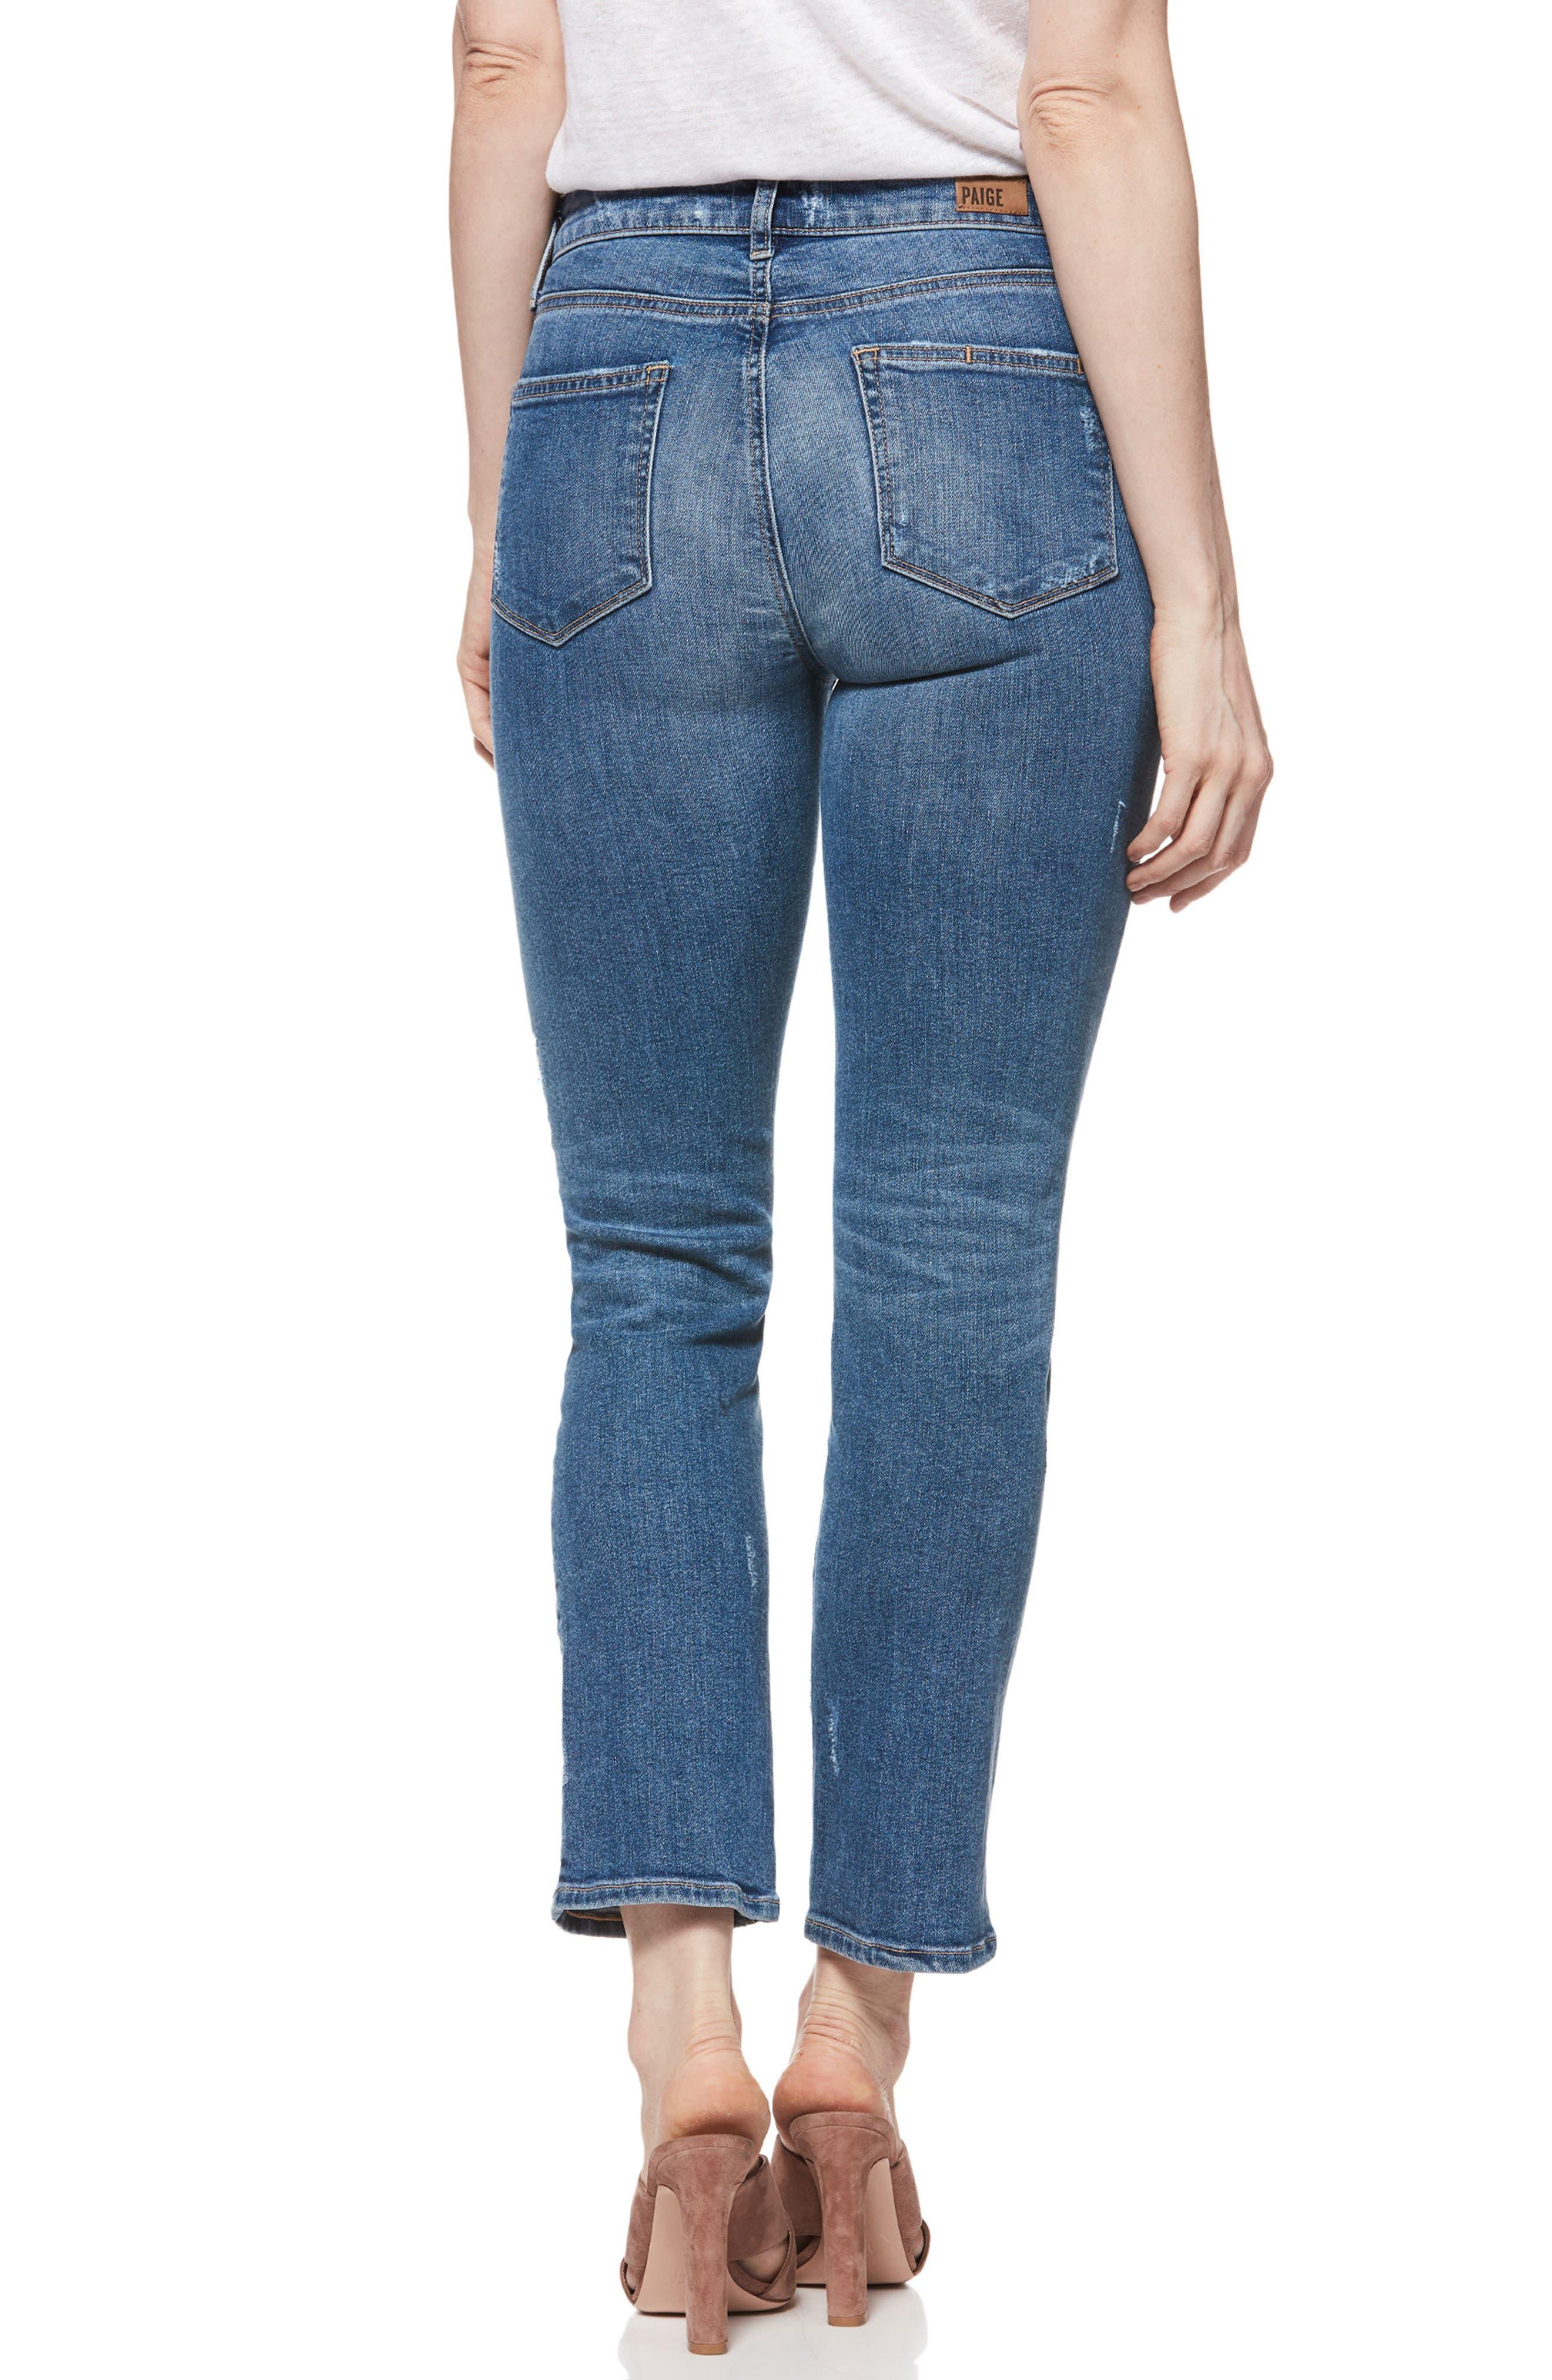 PAIGE, Verdugo Transcend Vintage Ripped Ankle Skinny Jeans, Alternate thumbnail 2, color, EMBARCADERO DESTRUCTED